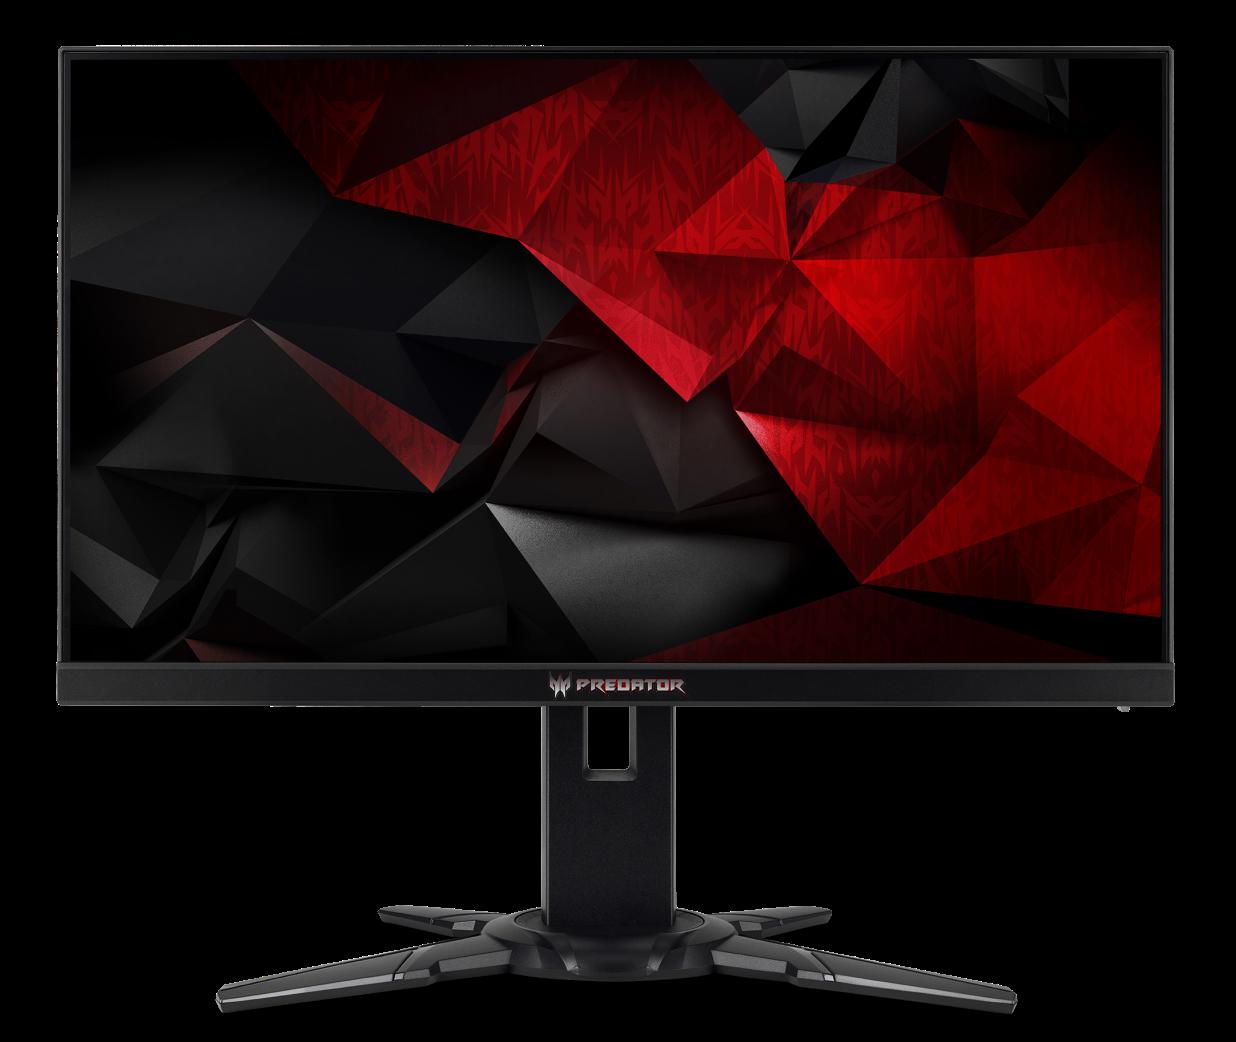 Acer LCD Predator XB252Qbmiprzx 24,5'' LED/1920x1080/100M:1/1ms/400nits/ HDMI, DP 1.2, USB3.0 Hub/repro/Black